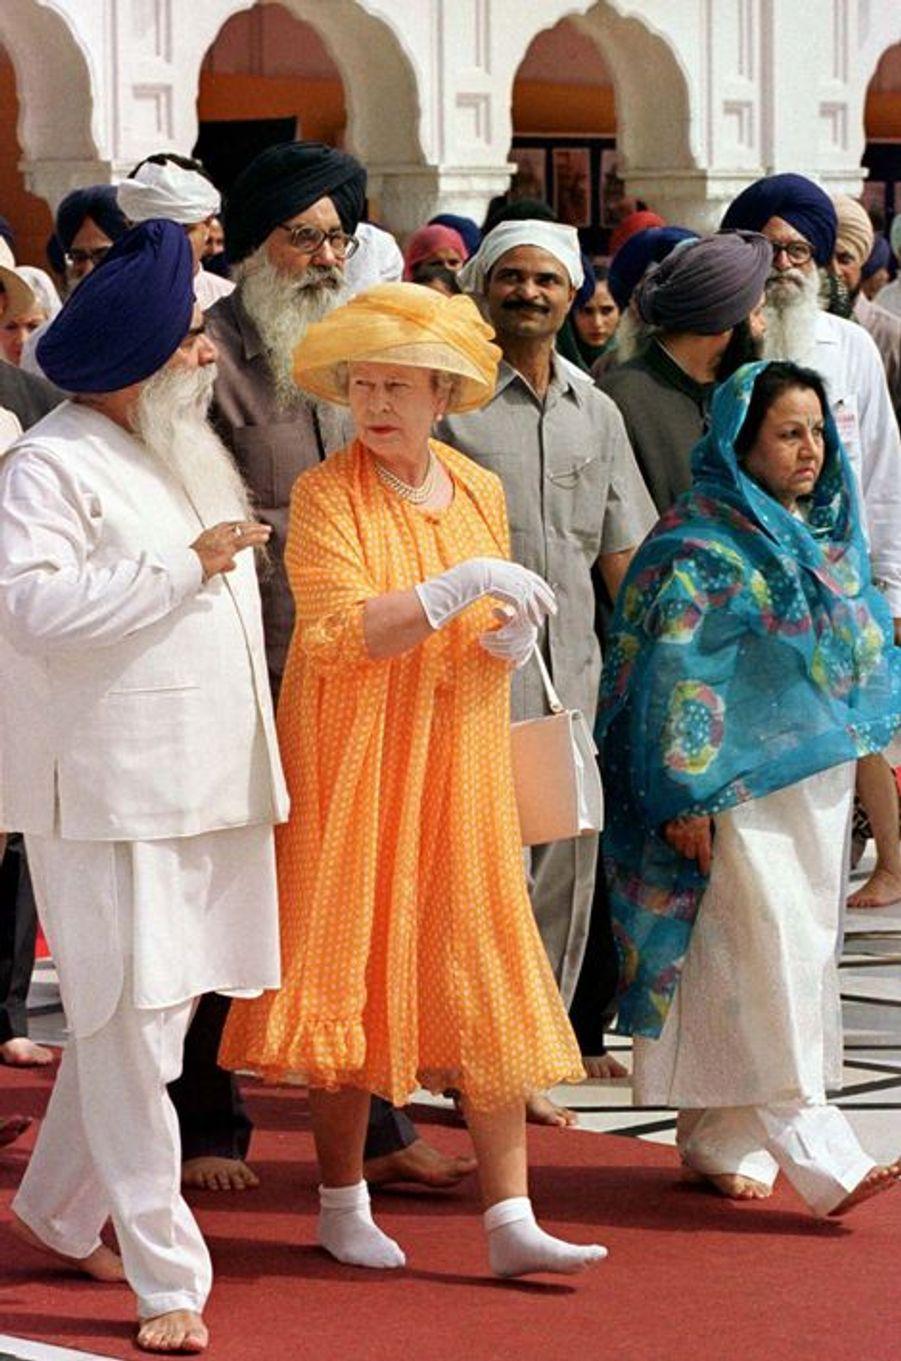 La reine Elizabeth II à Armritsar, le 14 octobre 1997